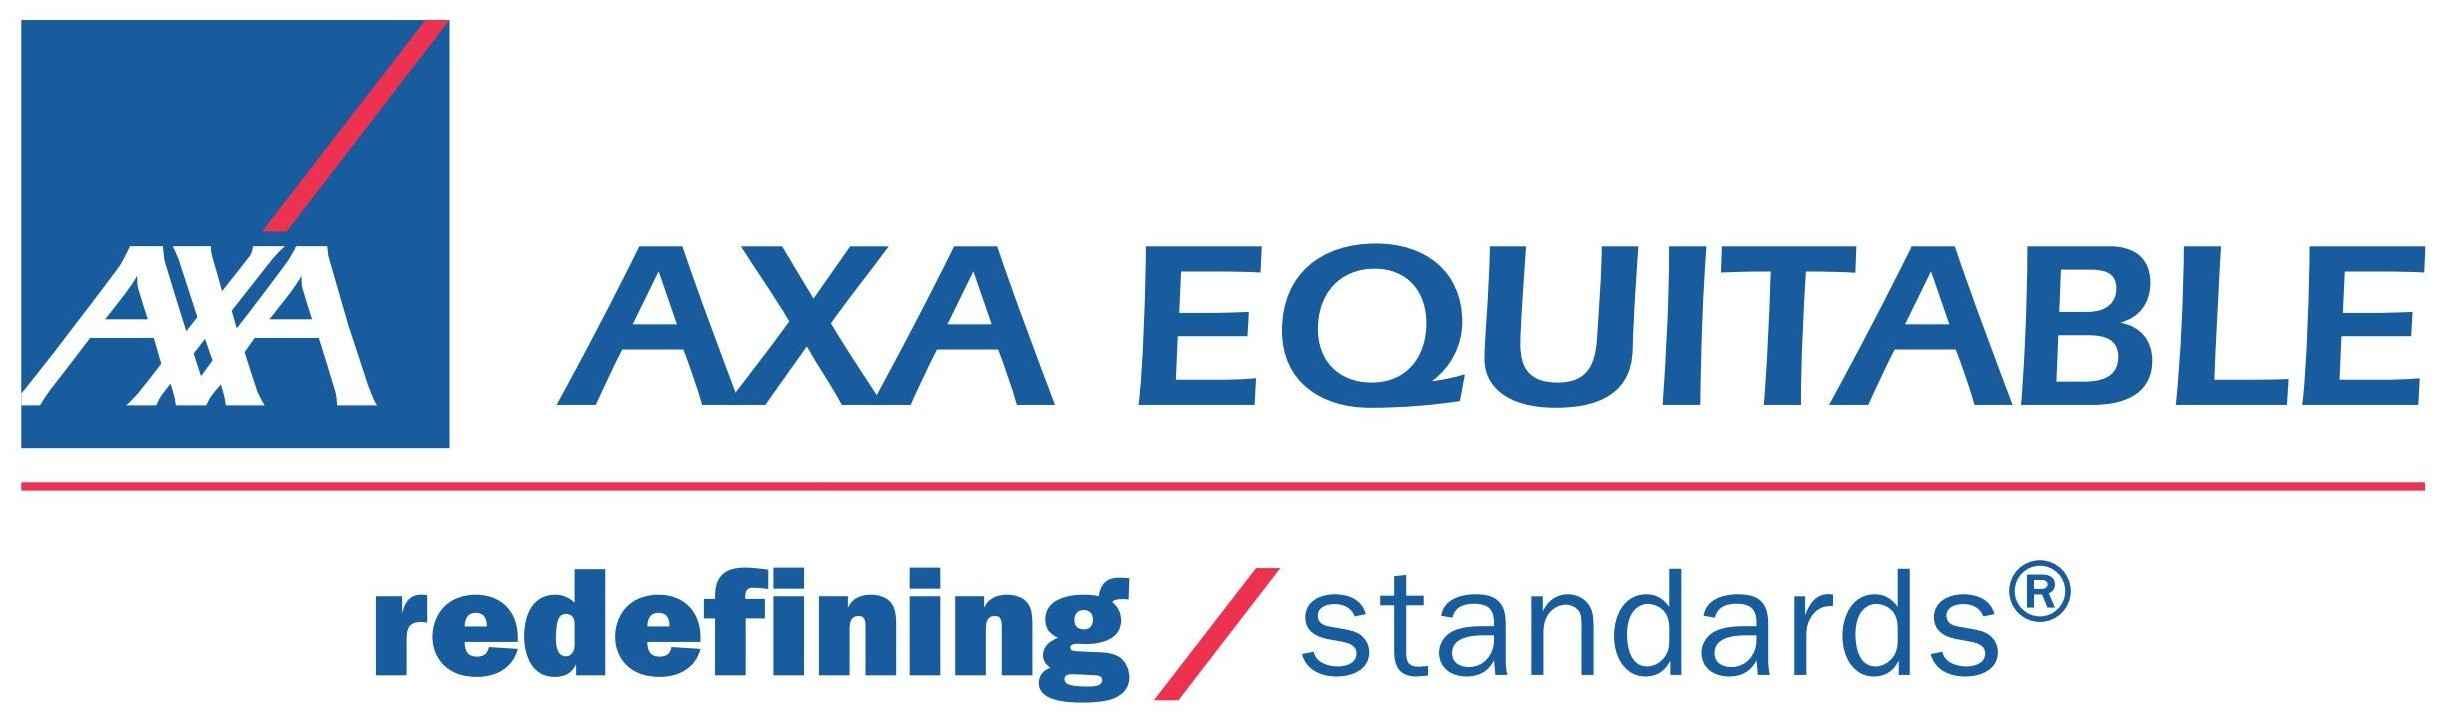 AXA-Equitable-Life-Insurance-Company-Logo